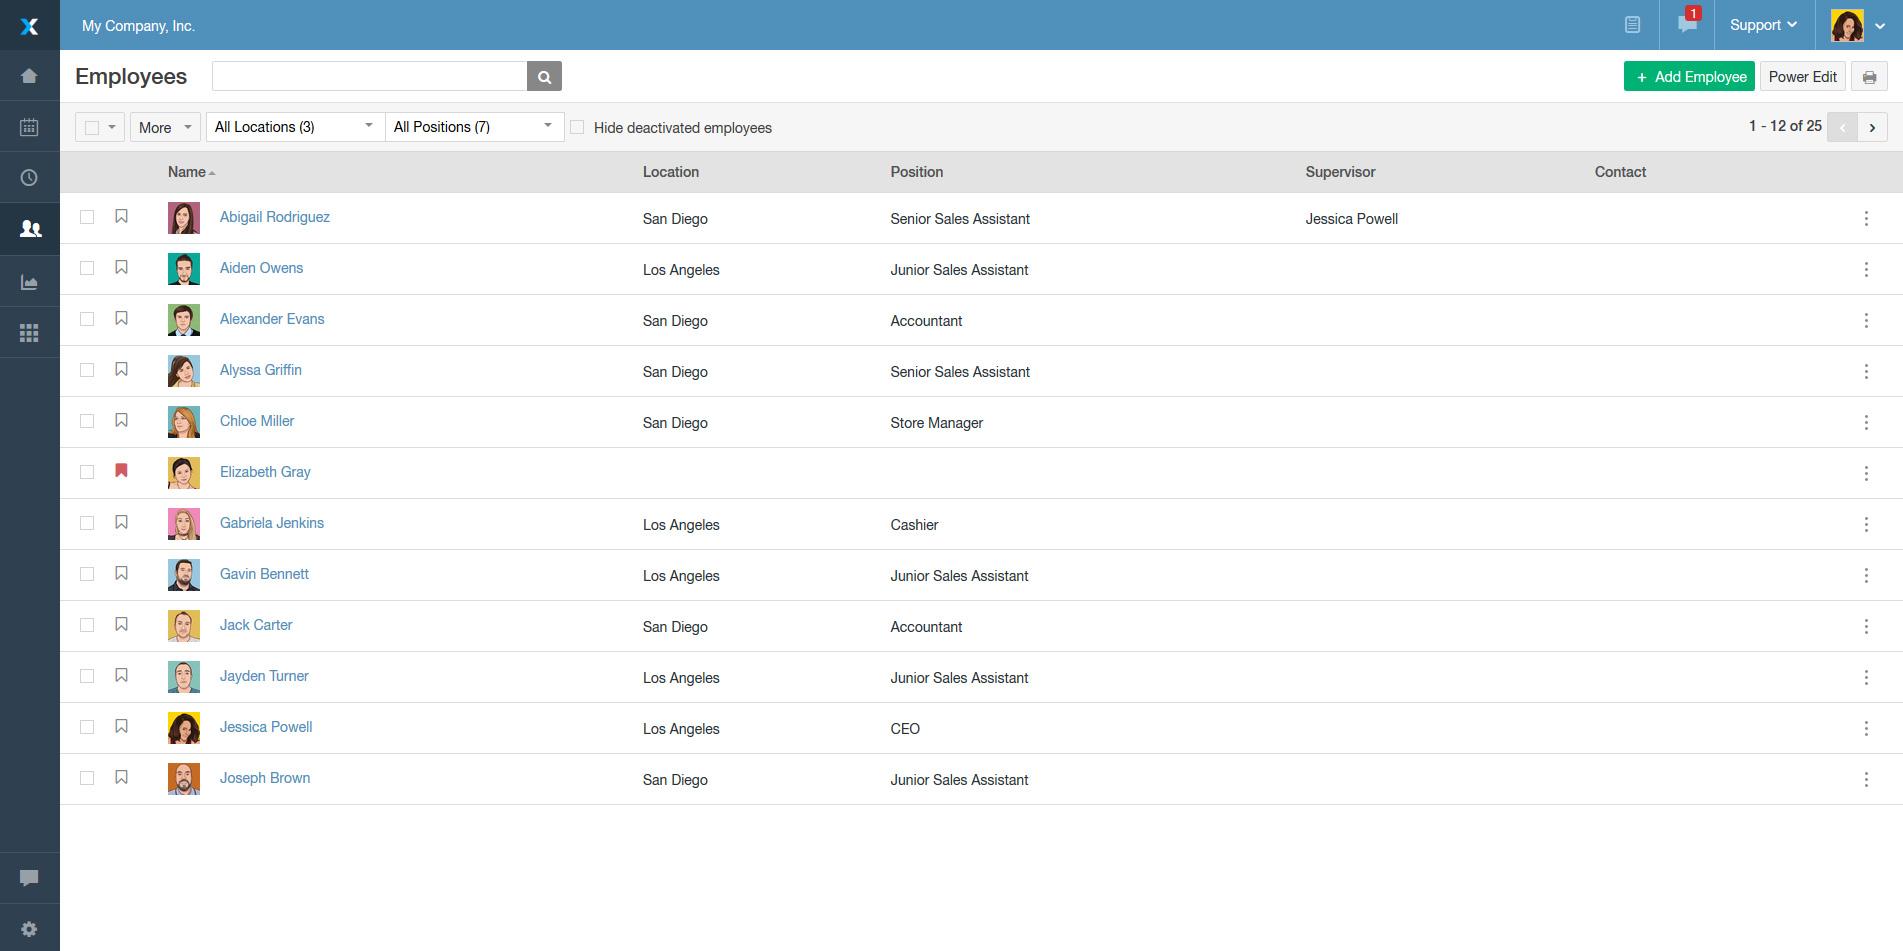 Ximble Demo - Manage Employee Profiles